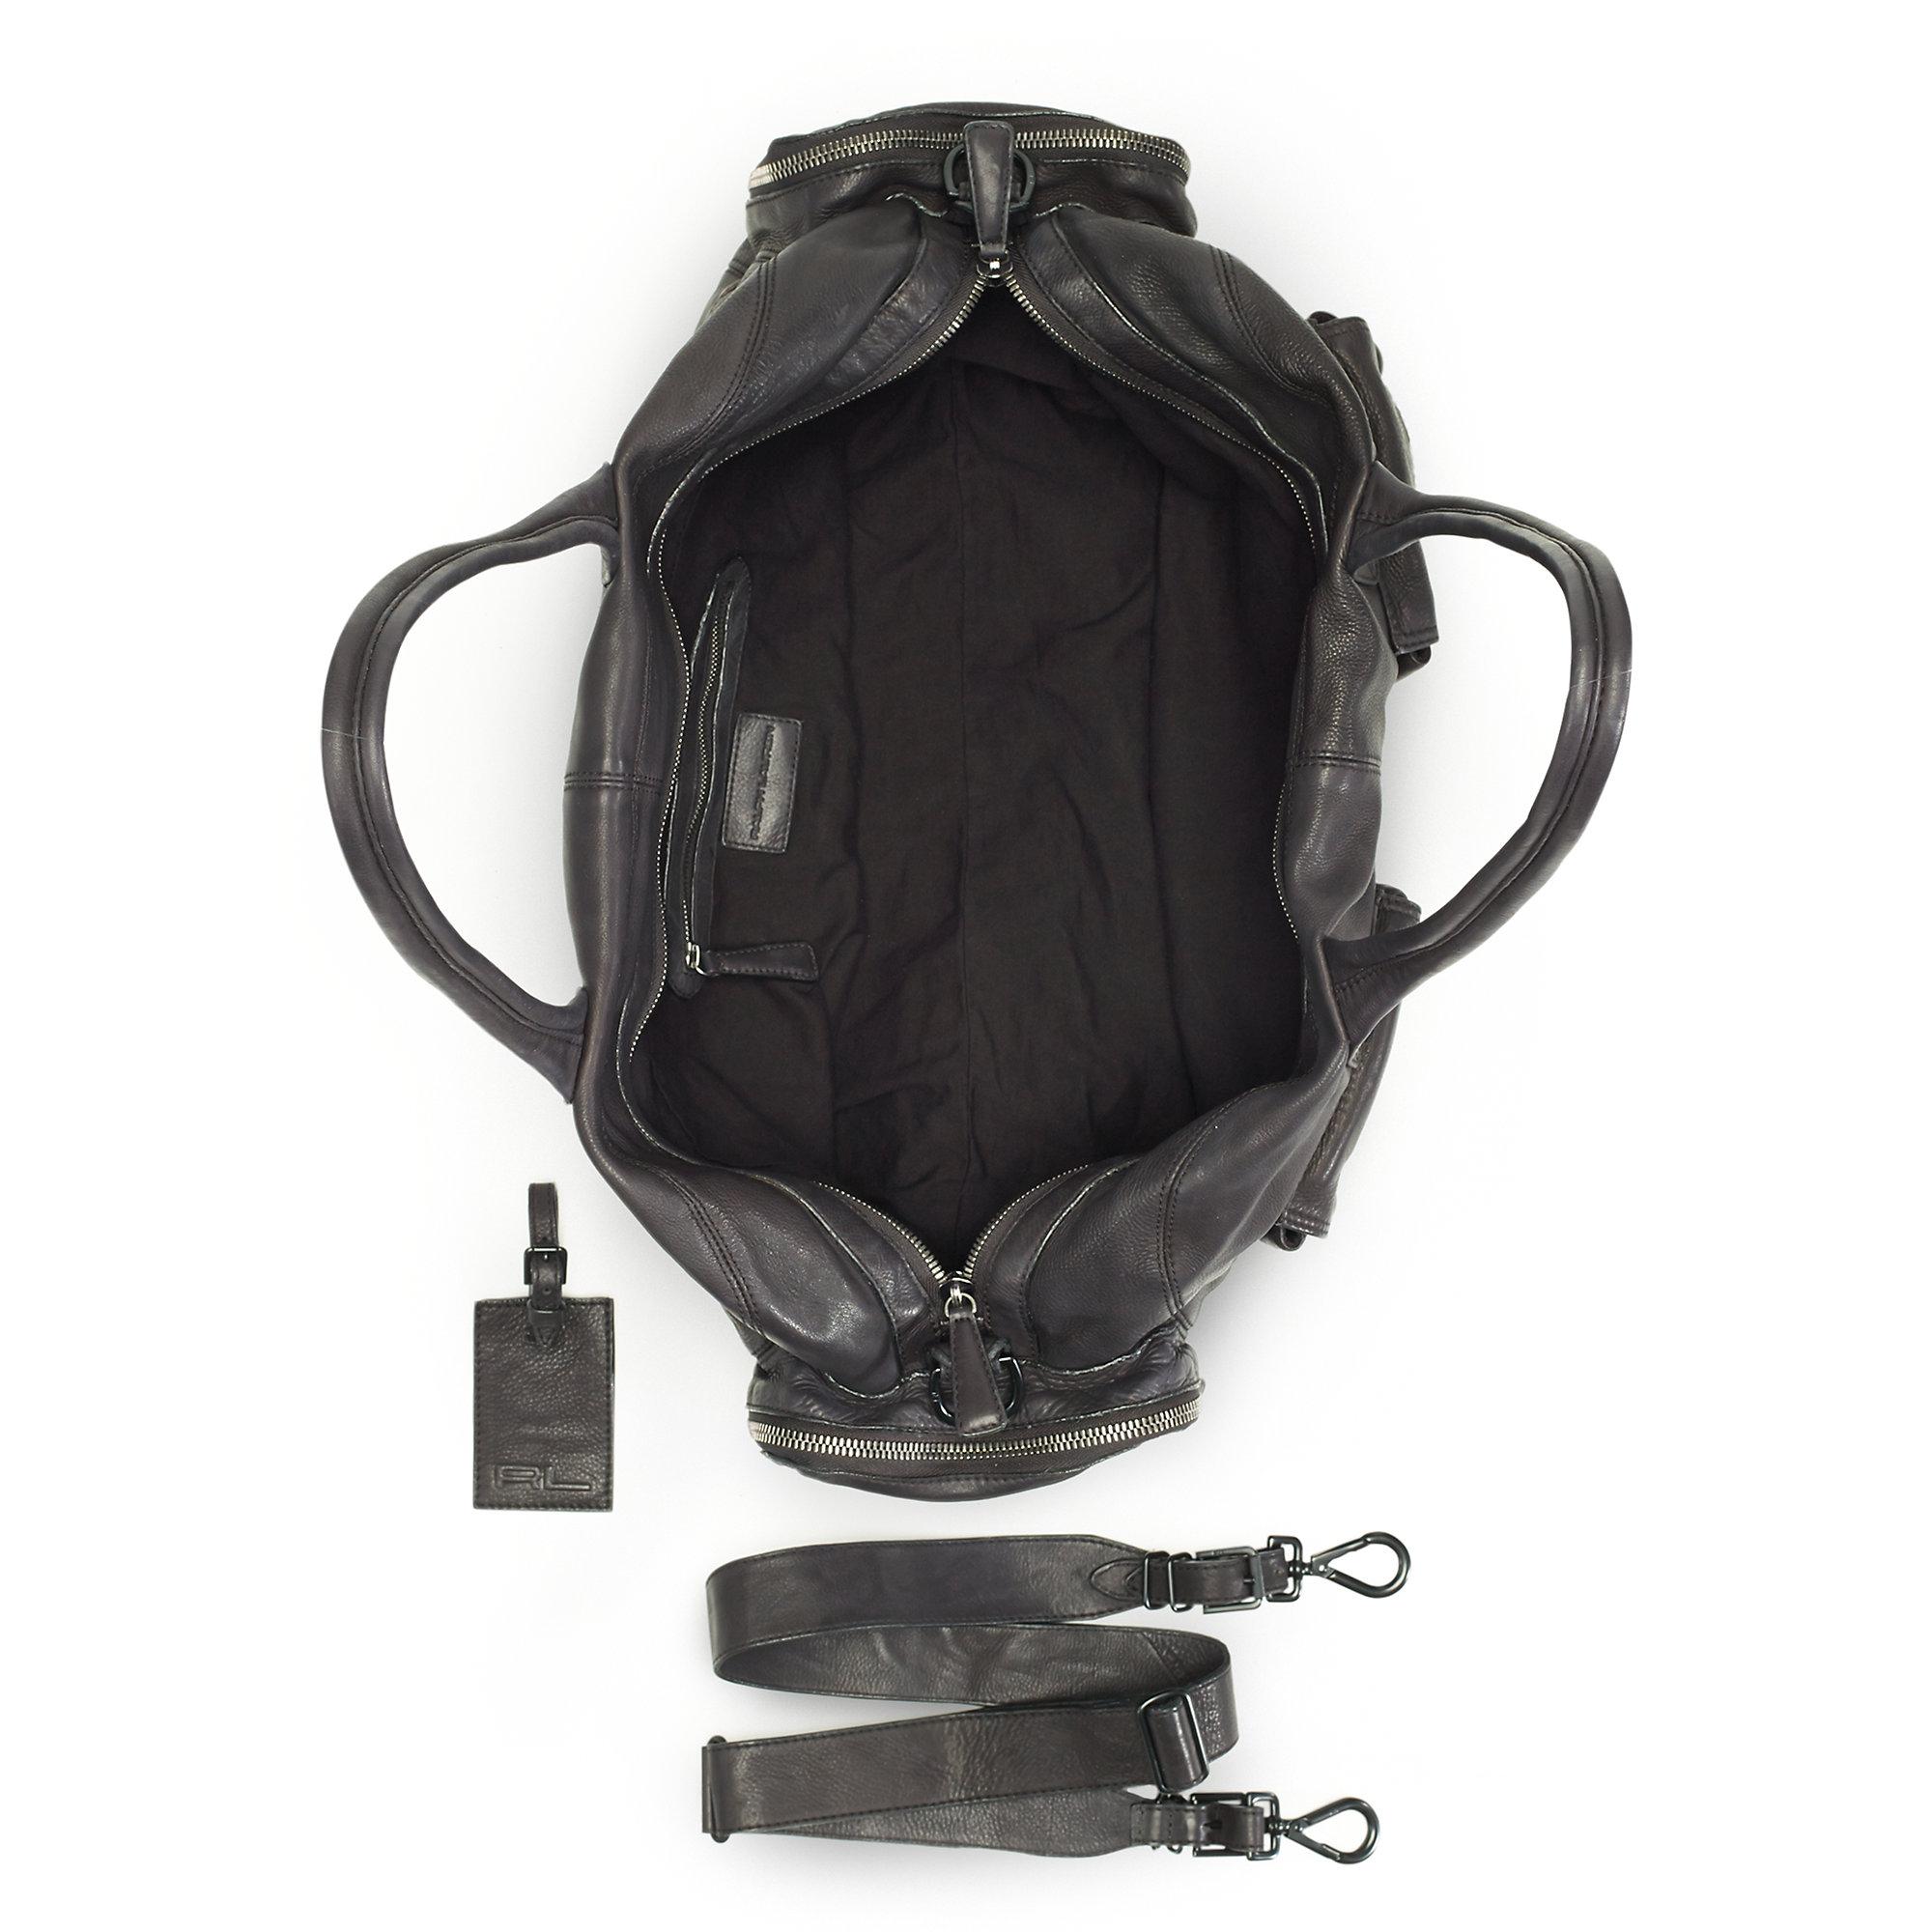 7ebe083ff528 Lyst - Ralph Lauren Black Label Distressed Leather Gym Bag in Black ...